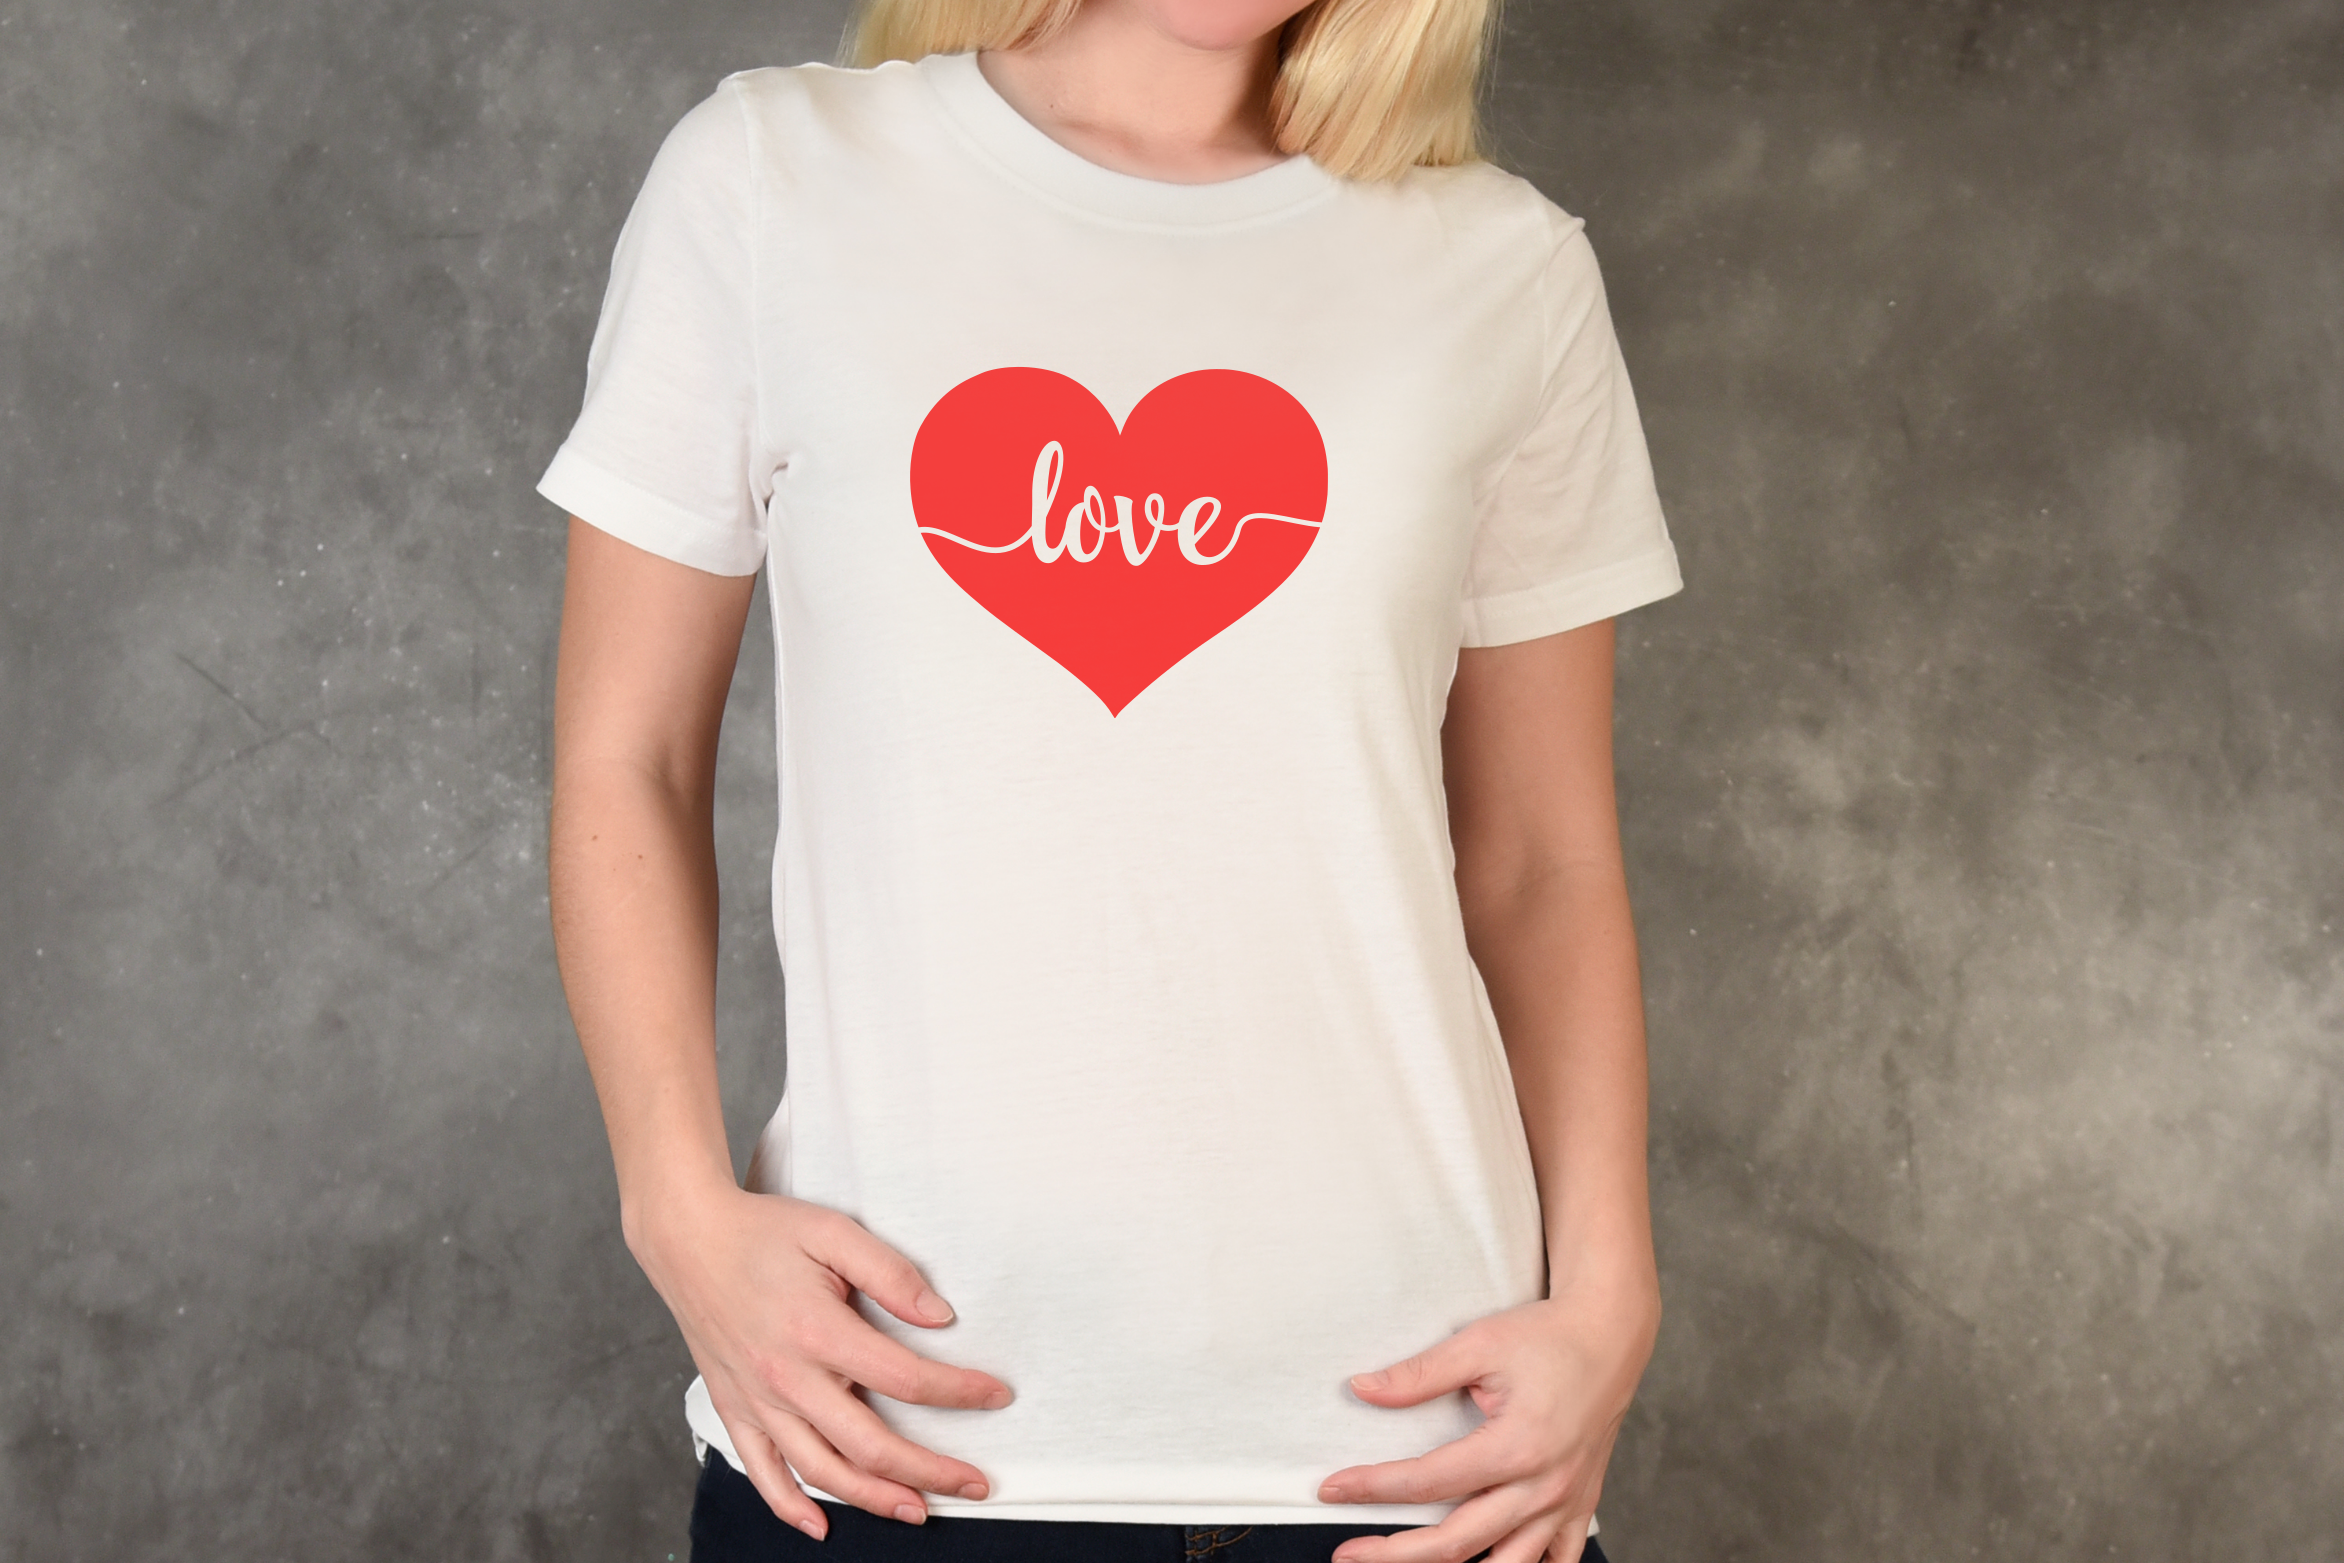 Love Svg, Heart Svg, Love Heart Svg, Valentine's Day Svg example image 2